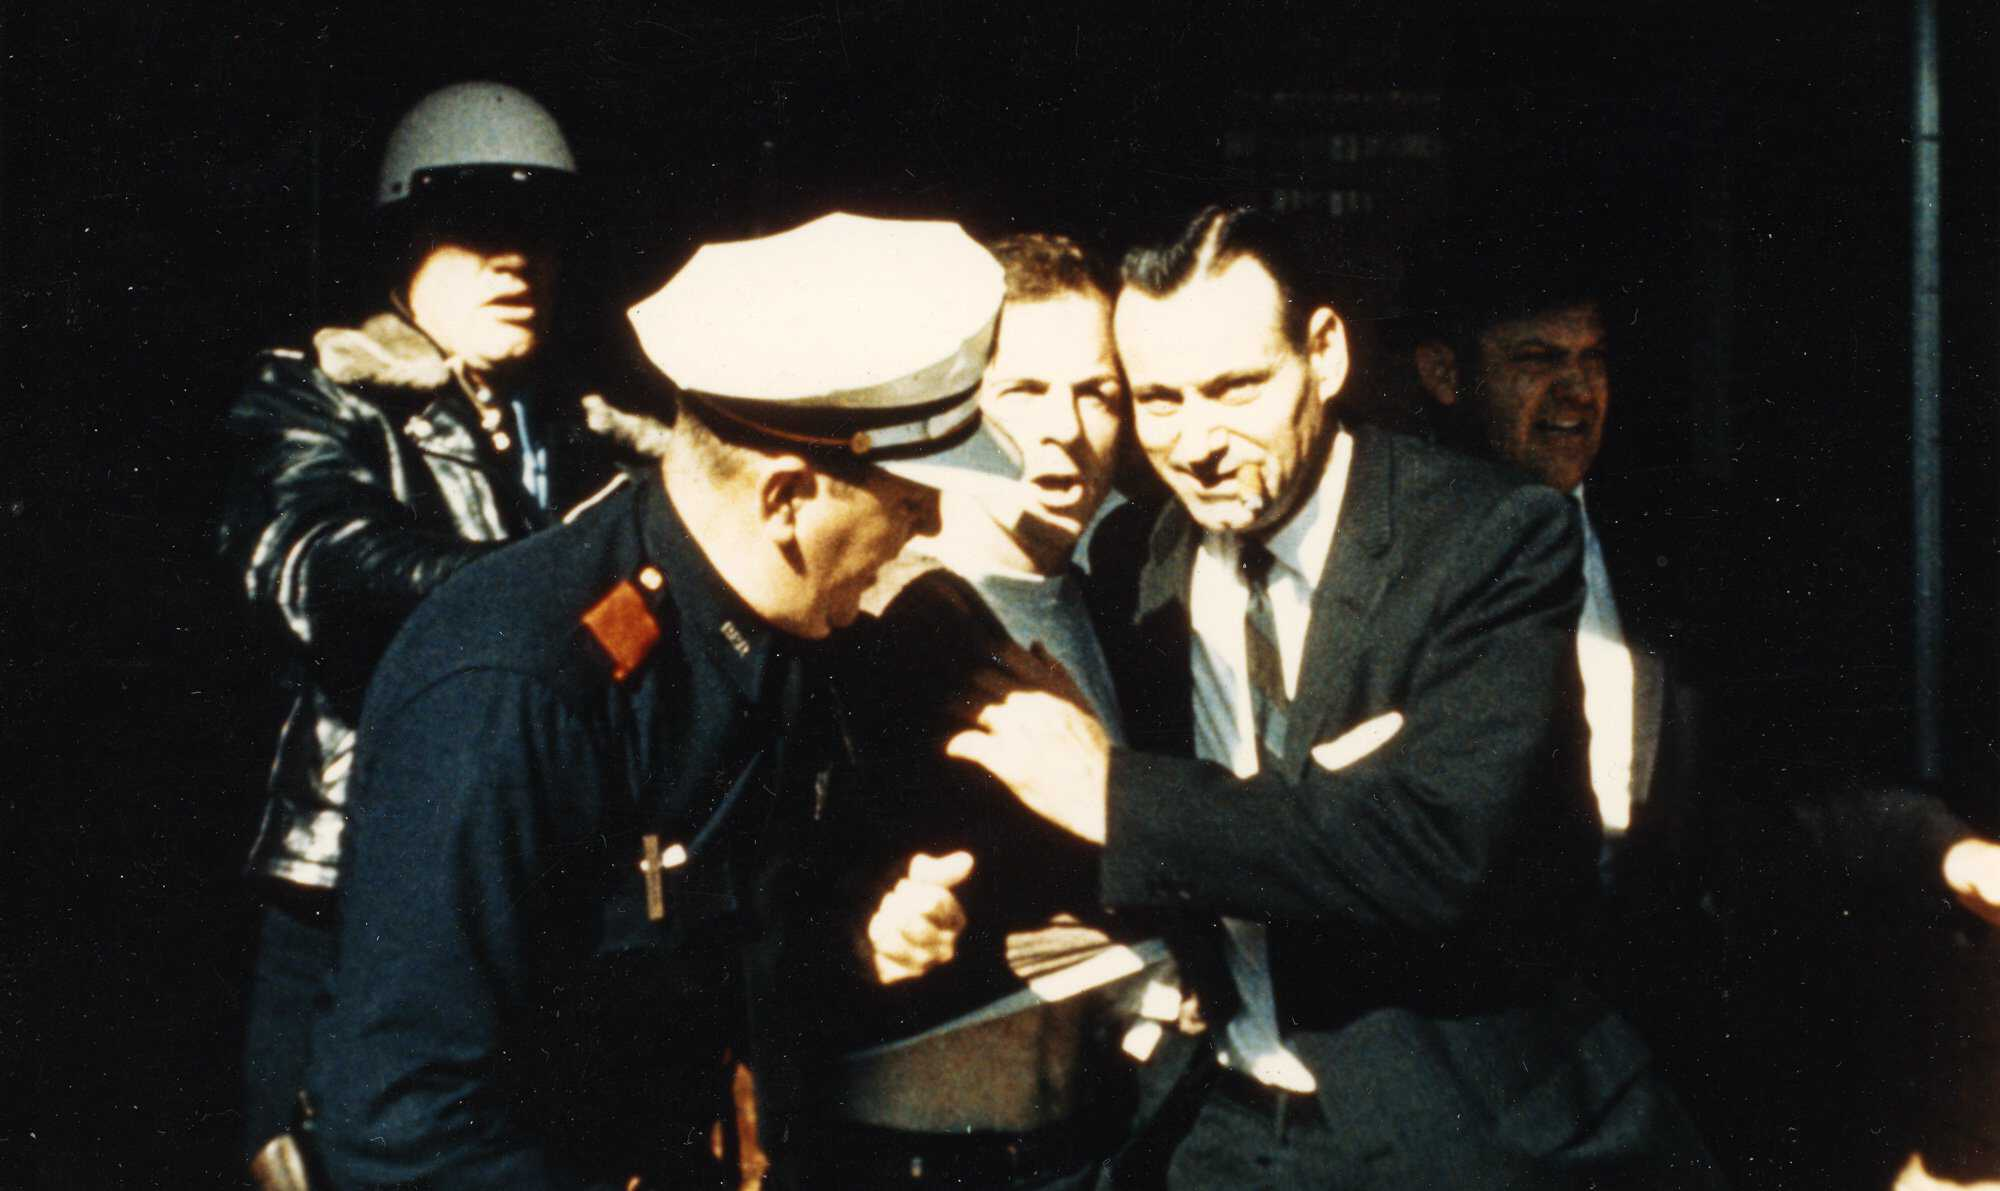 Oswald-timeline-8b-t_1963_nov22_1.40cst.jpg